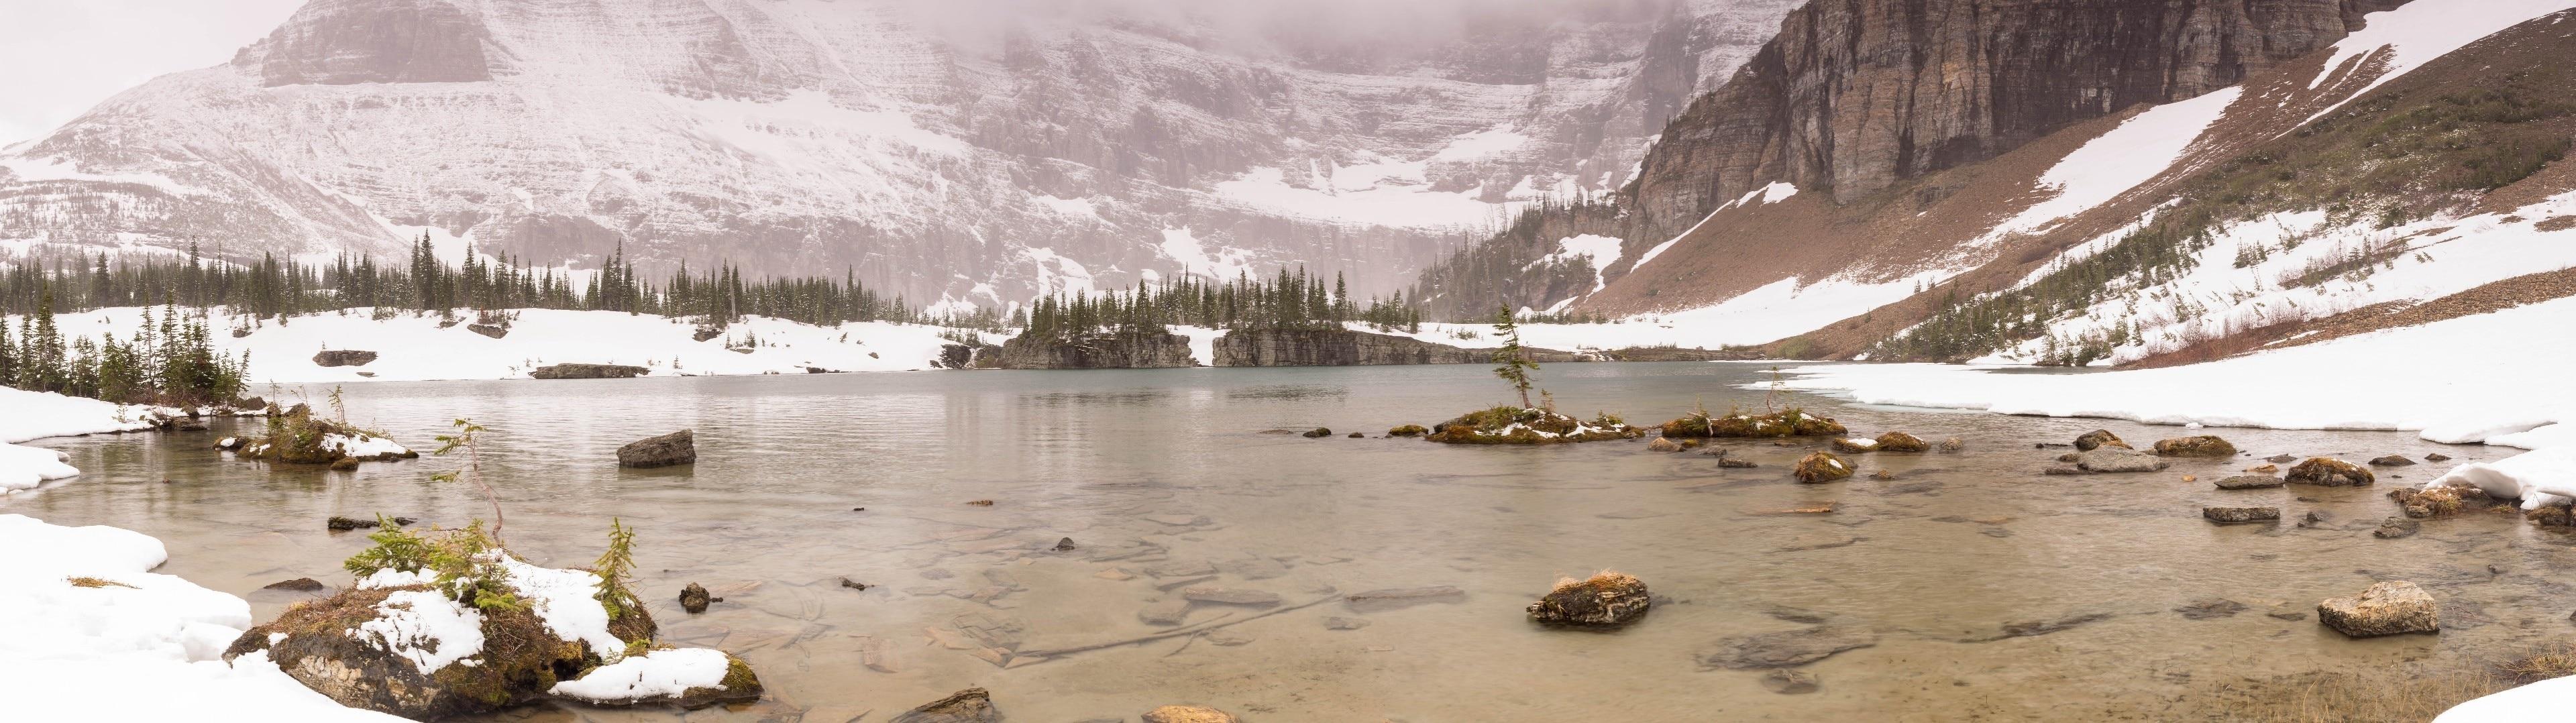 Iceberg Lake, East Glacier Park, Montana, United States of America